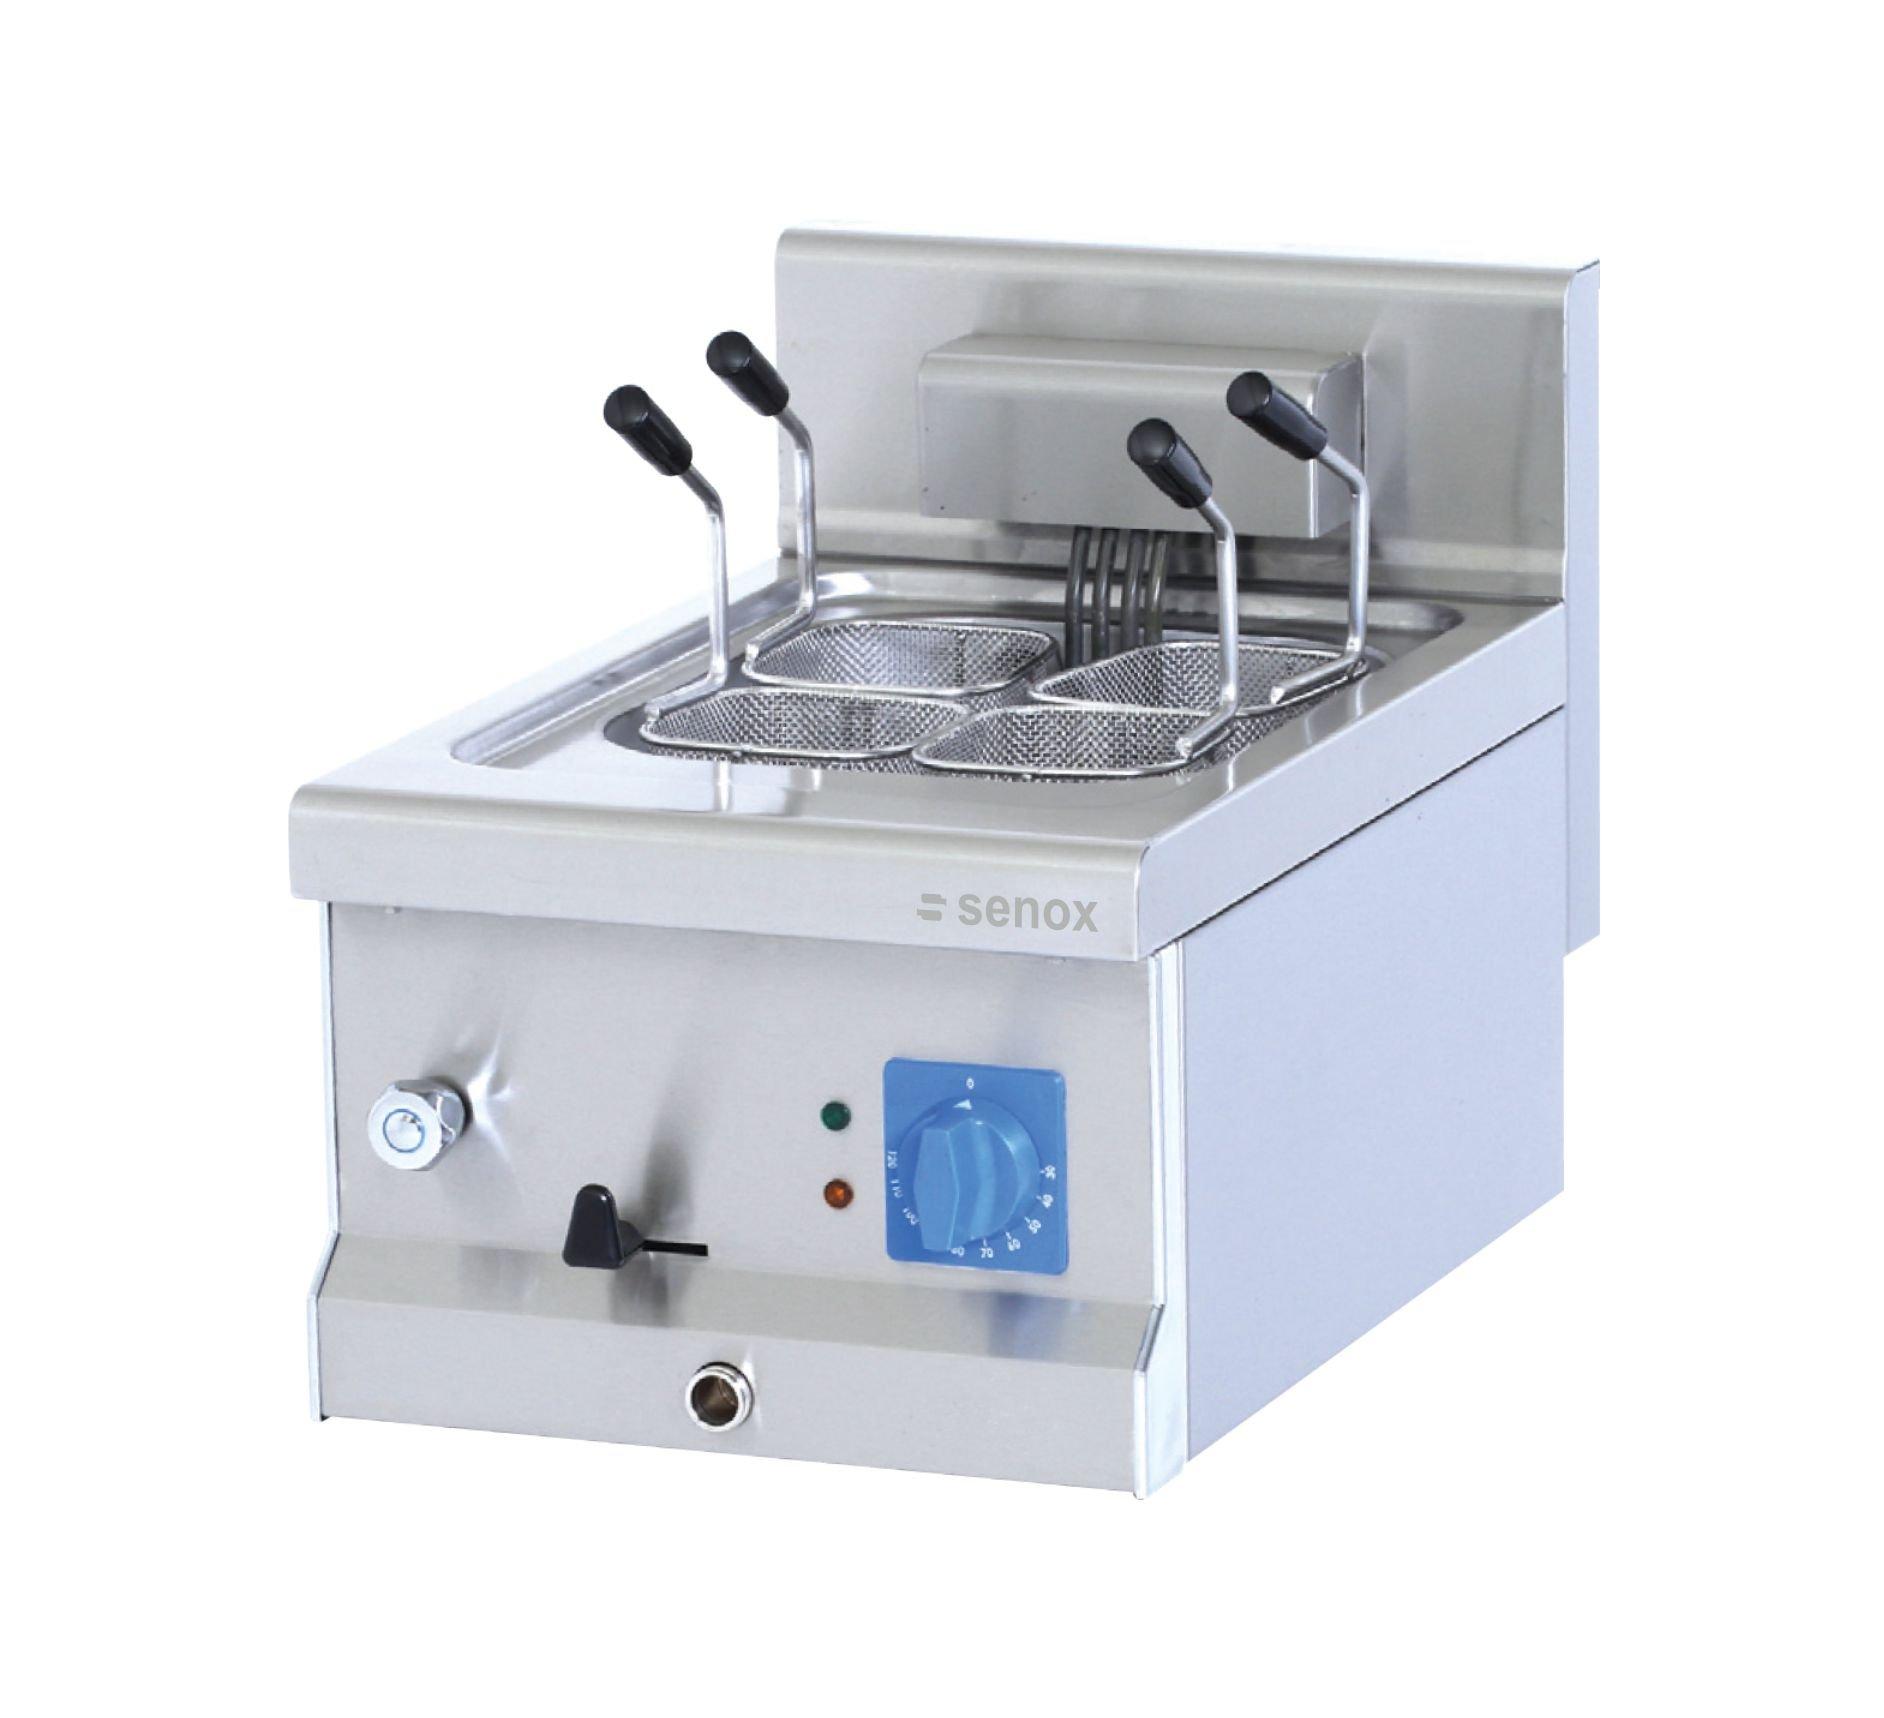 senox-amp-460-makarna-pisirici